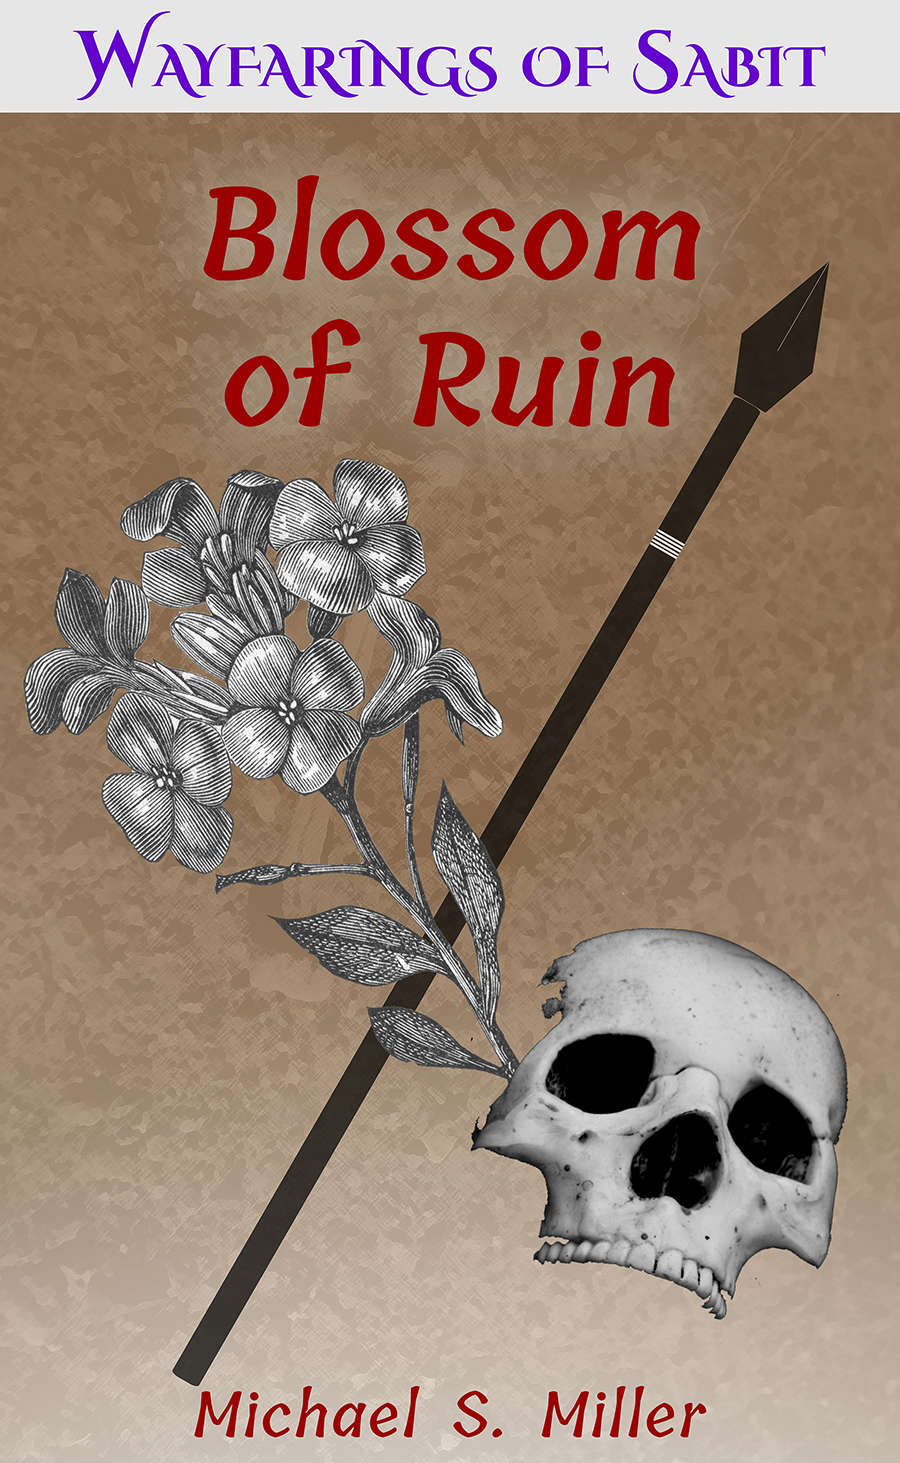 Blossom of Ruin: Wayfarings of Sabit: One